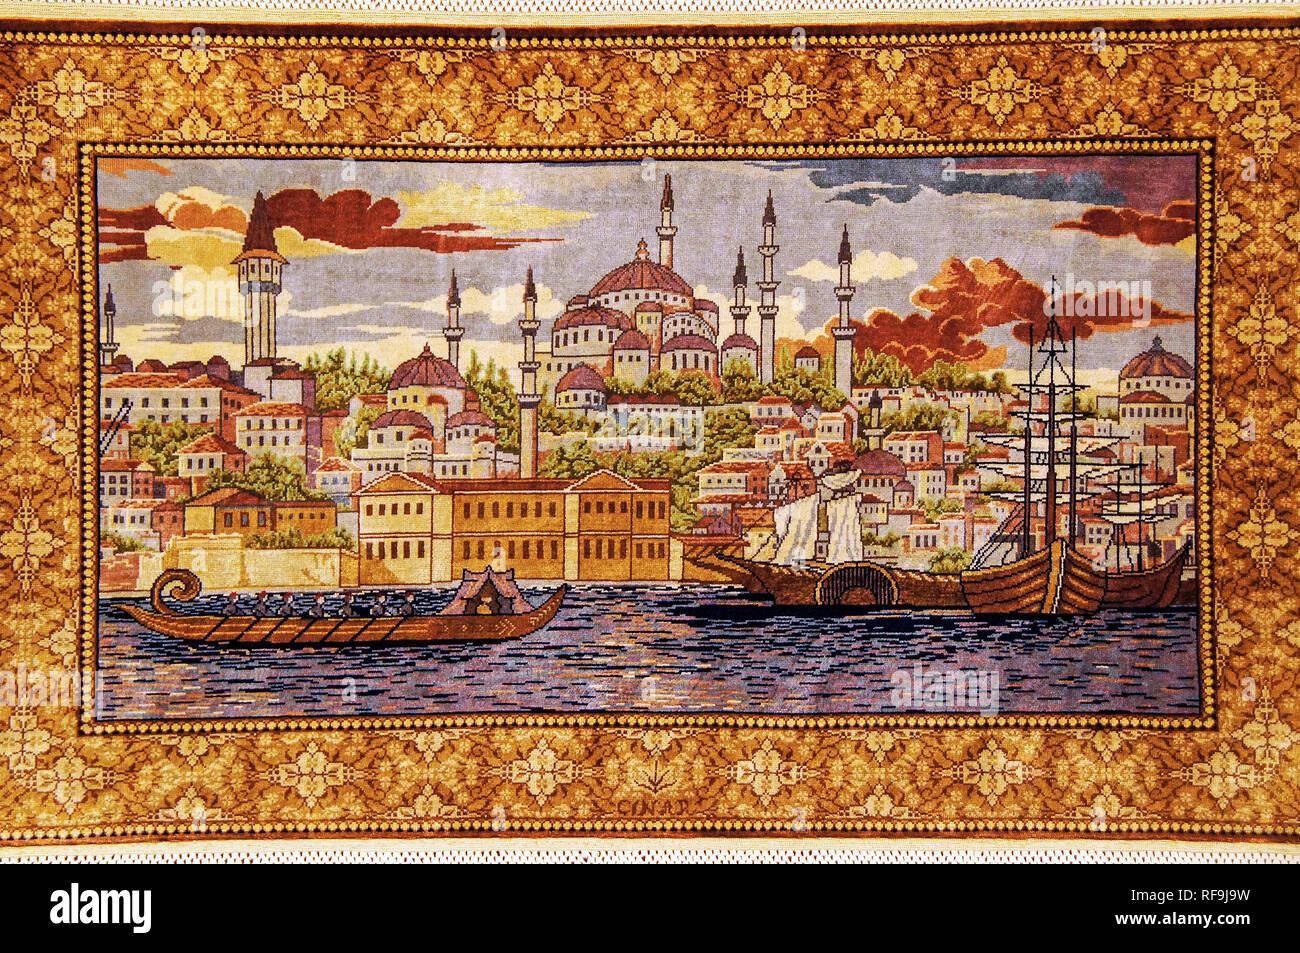 Türkische Teppiche in Avanos. Kappadokien, Anatolien. Türkei Stockfoto